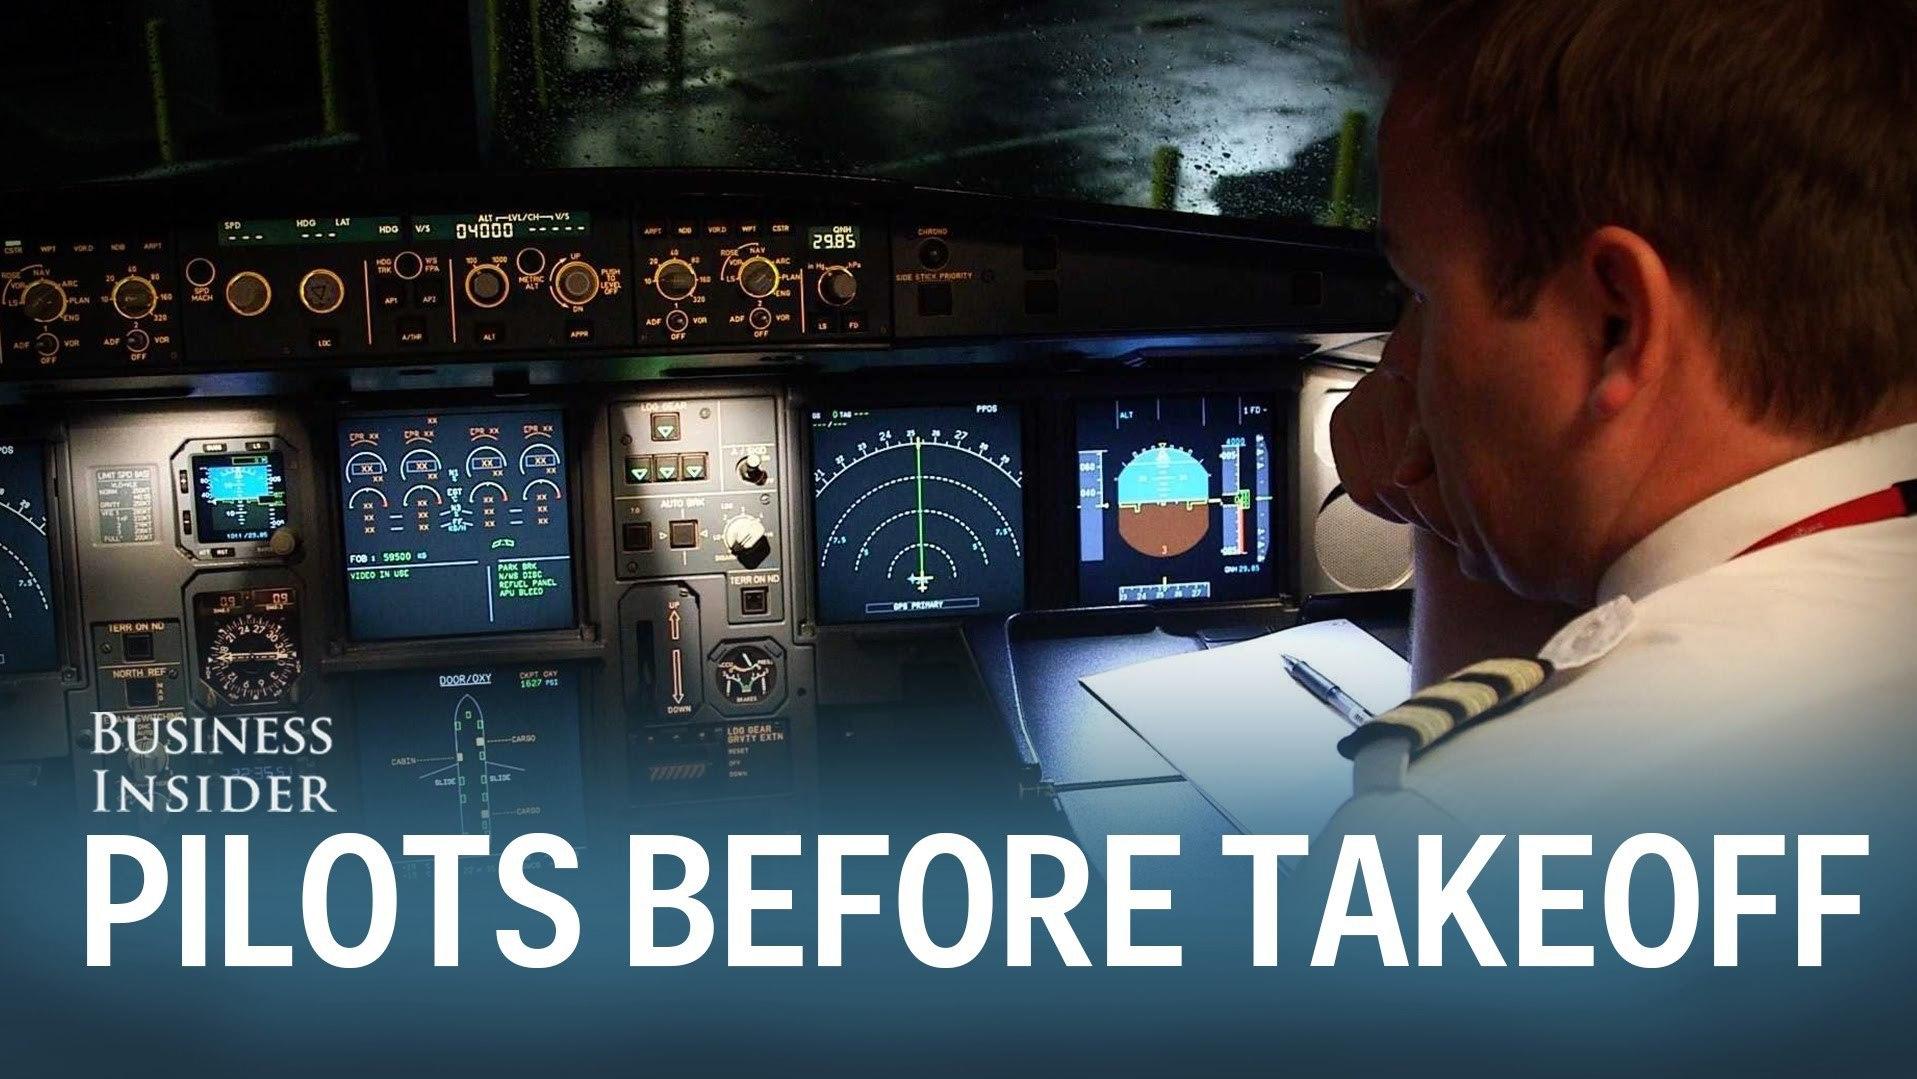 Flygcforumcom Virgin Atlantic Pilot Pr Circuit Board Elite Miracle1 Gates